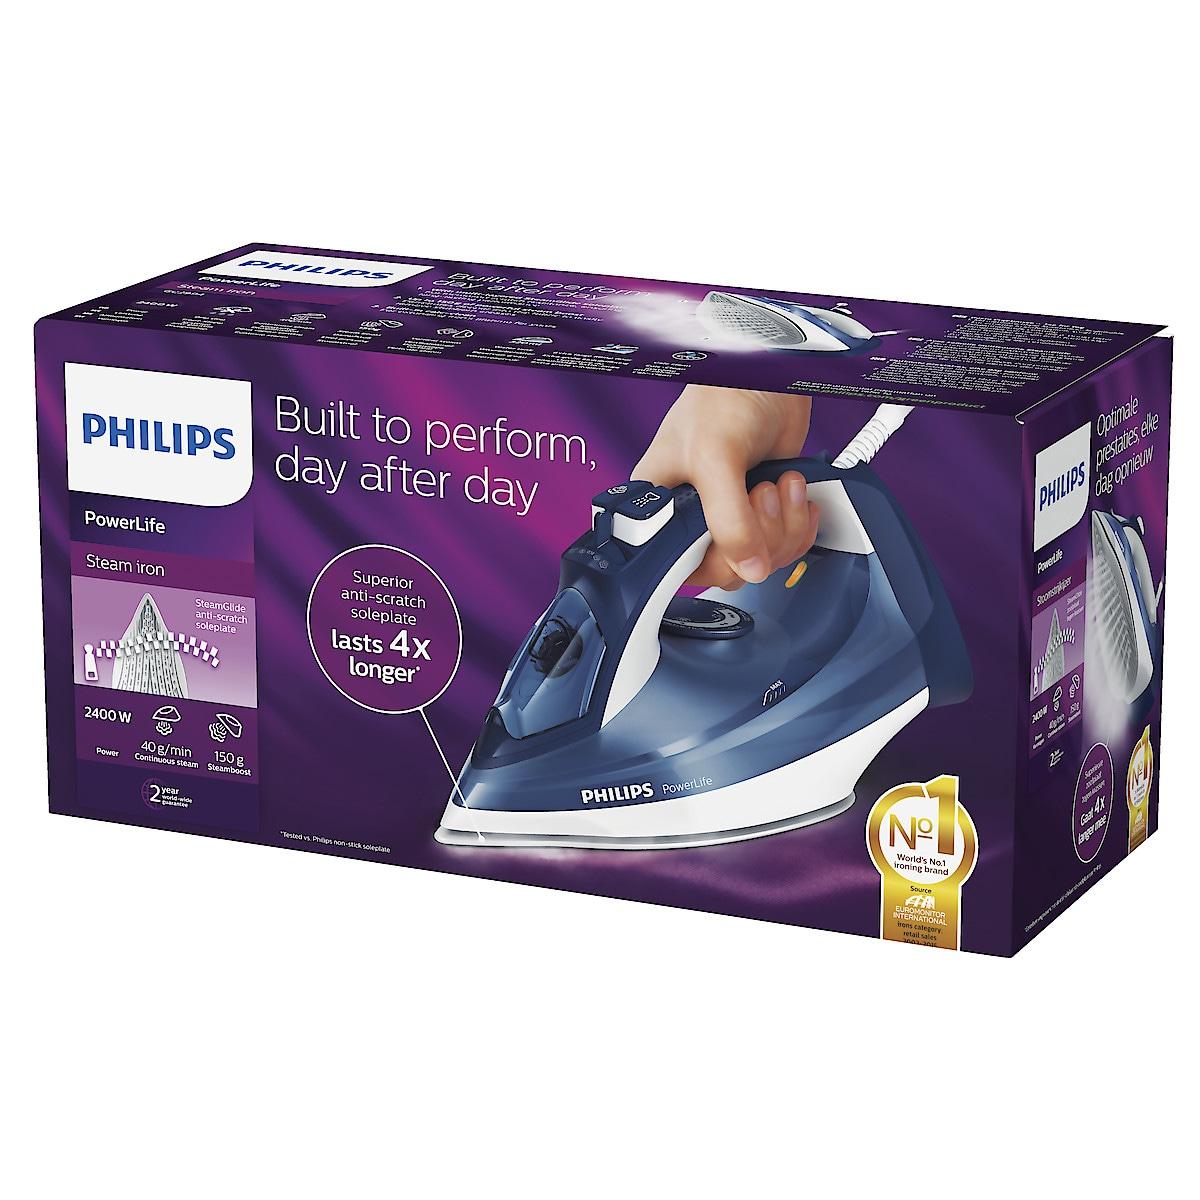 Philips PowerLife GC2994/20 strykejern